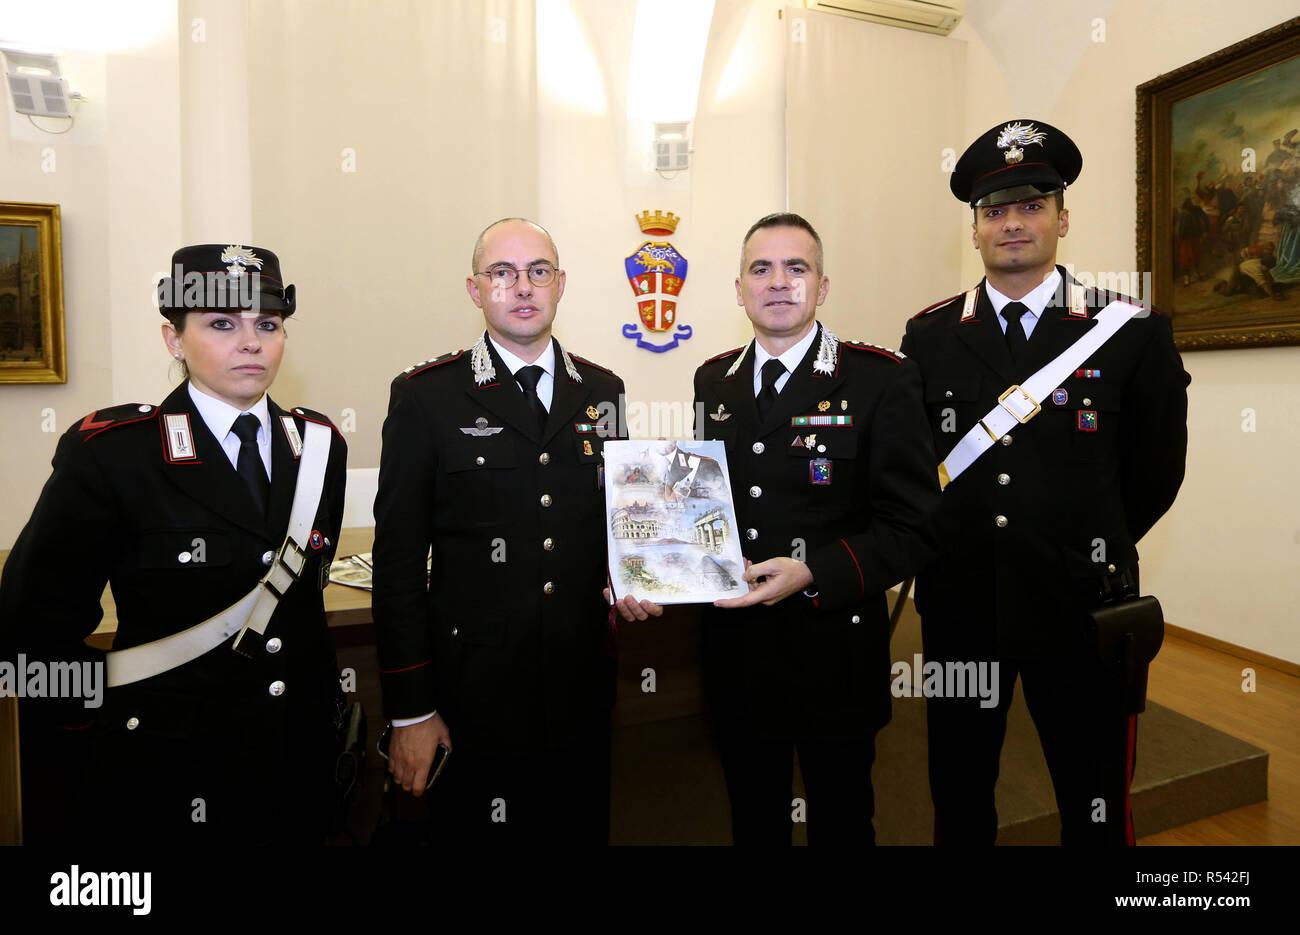 Foto Lapresse Stefano Porta 29112018 Milano Mi Cronaca